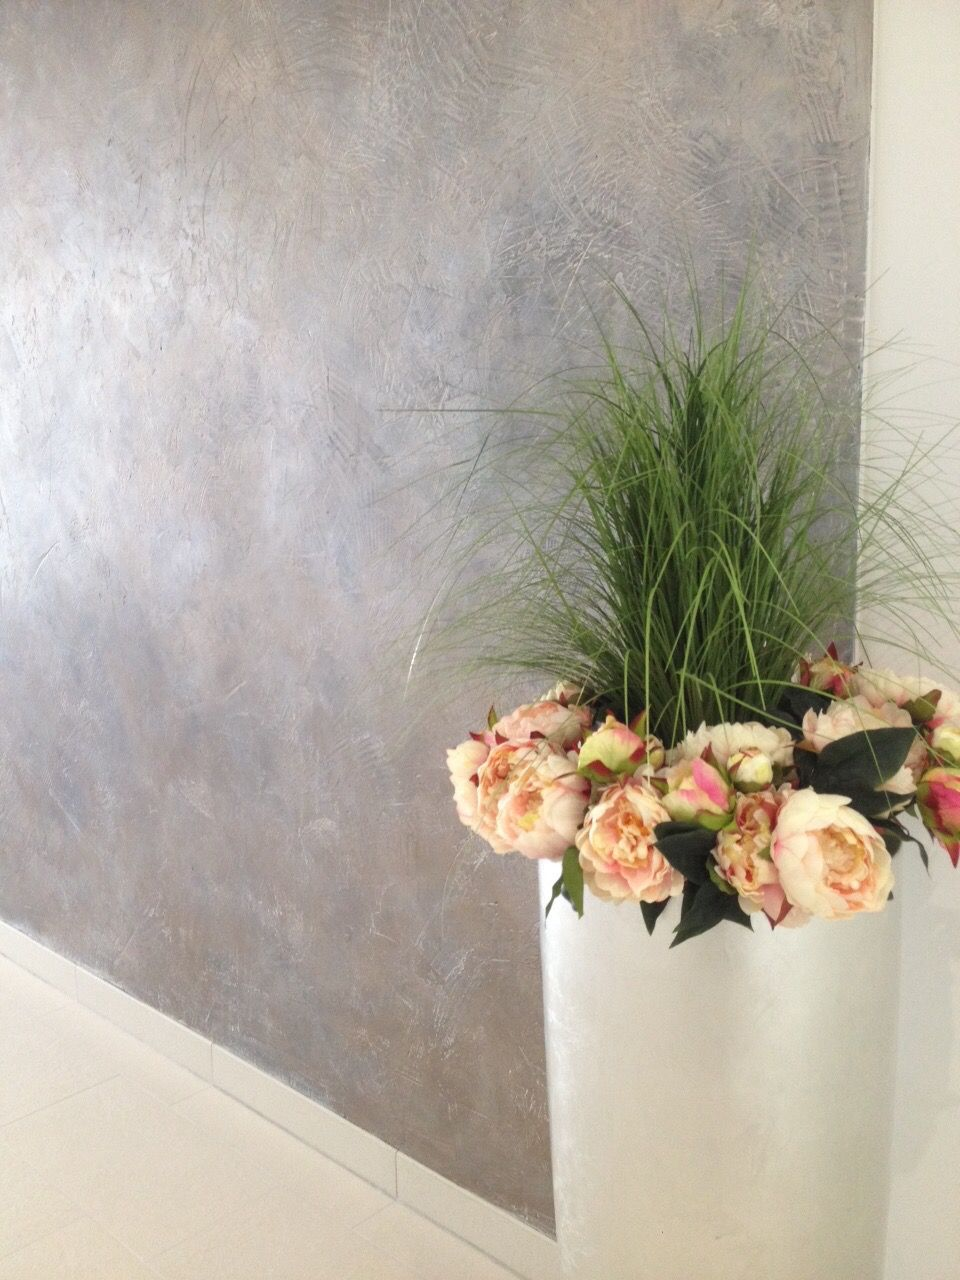 Individuelle, Hochwertige Wandgestaltung! #wandgestaltung #walldesign  #cavallo #maler #painter #